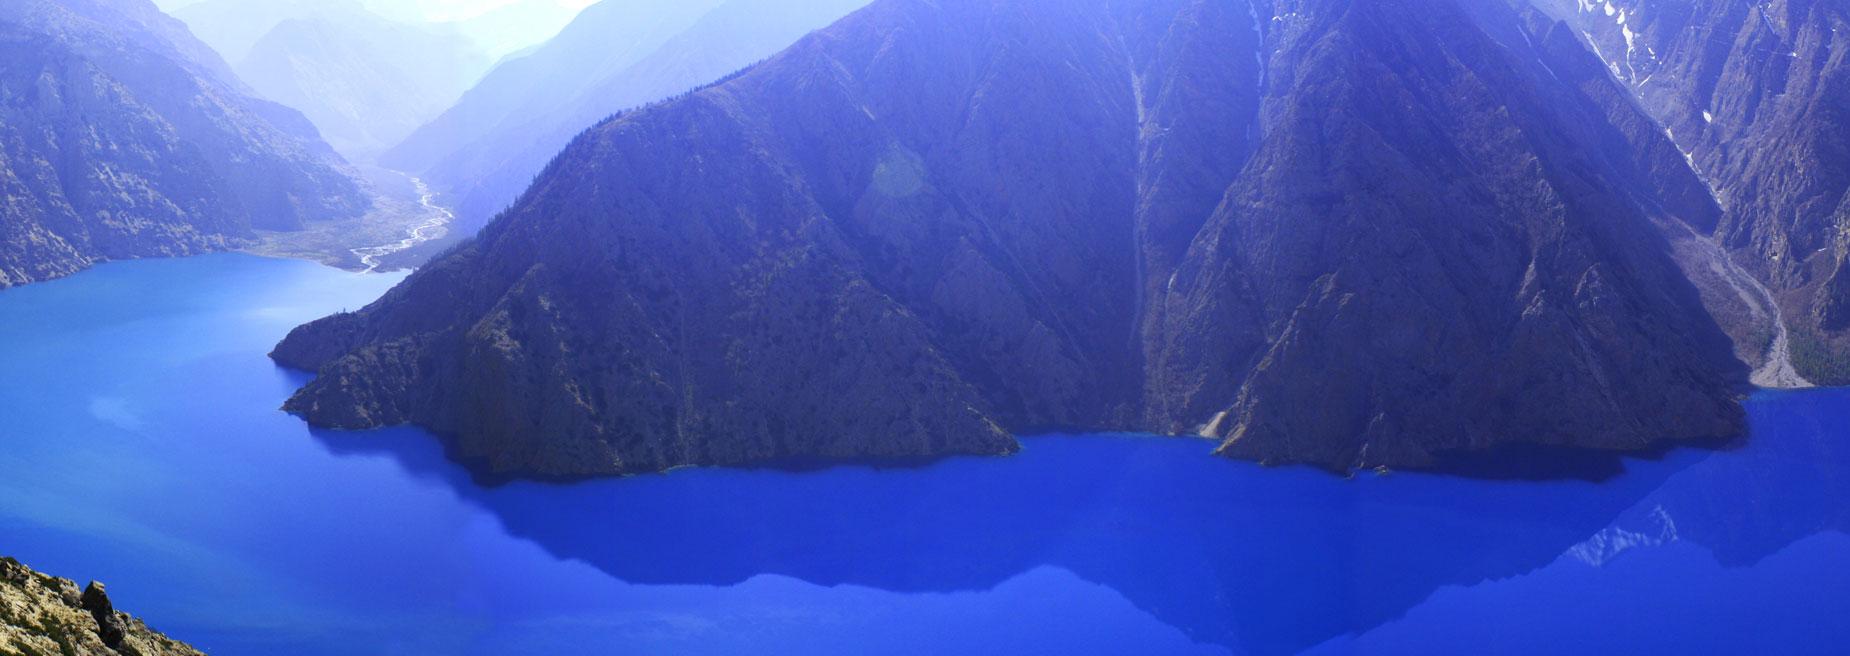 She Phoksundo Lake, Dolpo